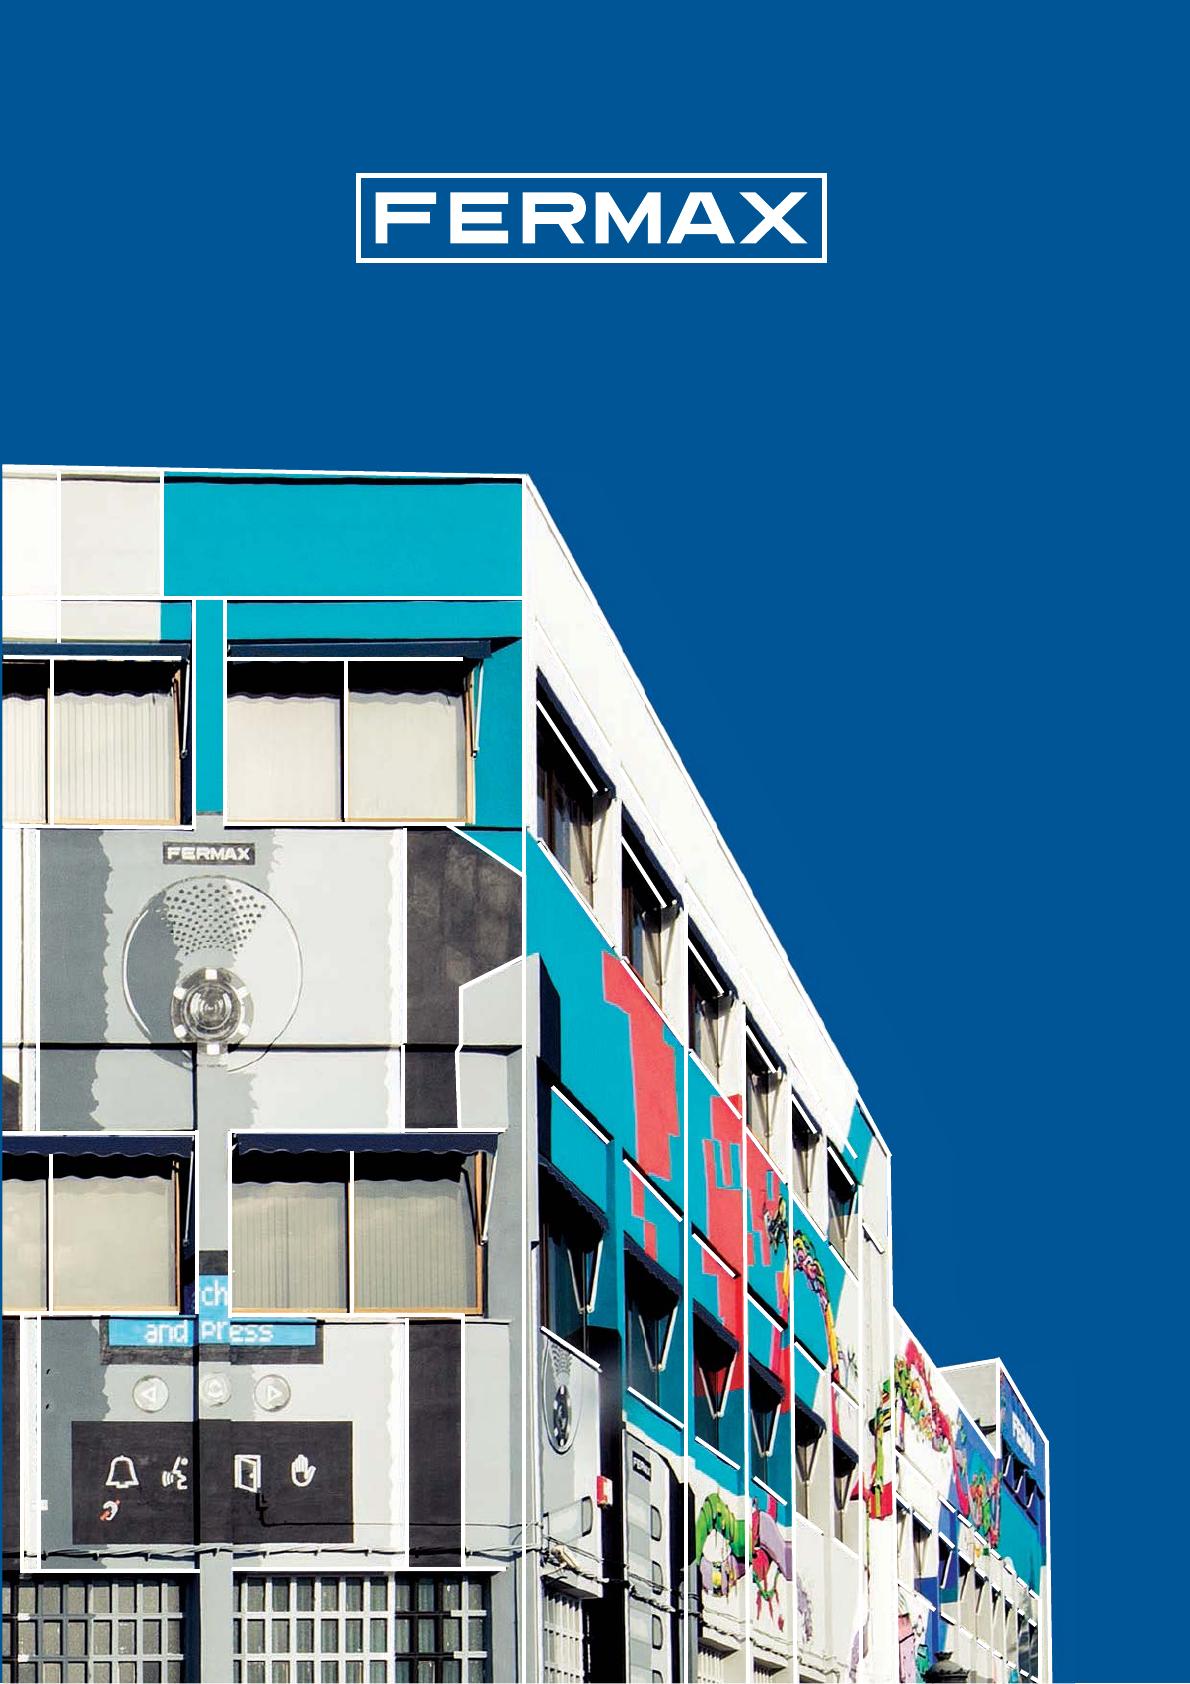 fermax monitor loft vds manual